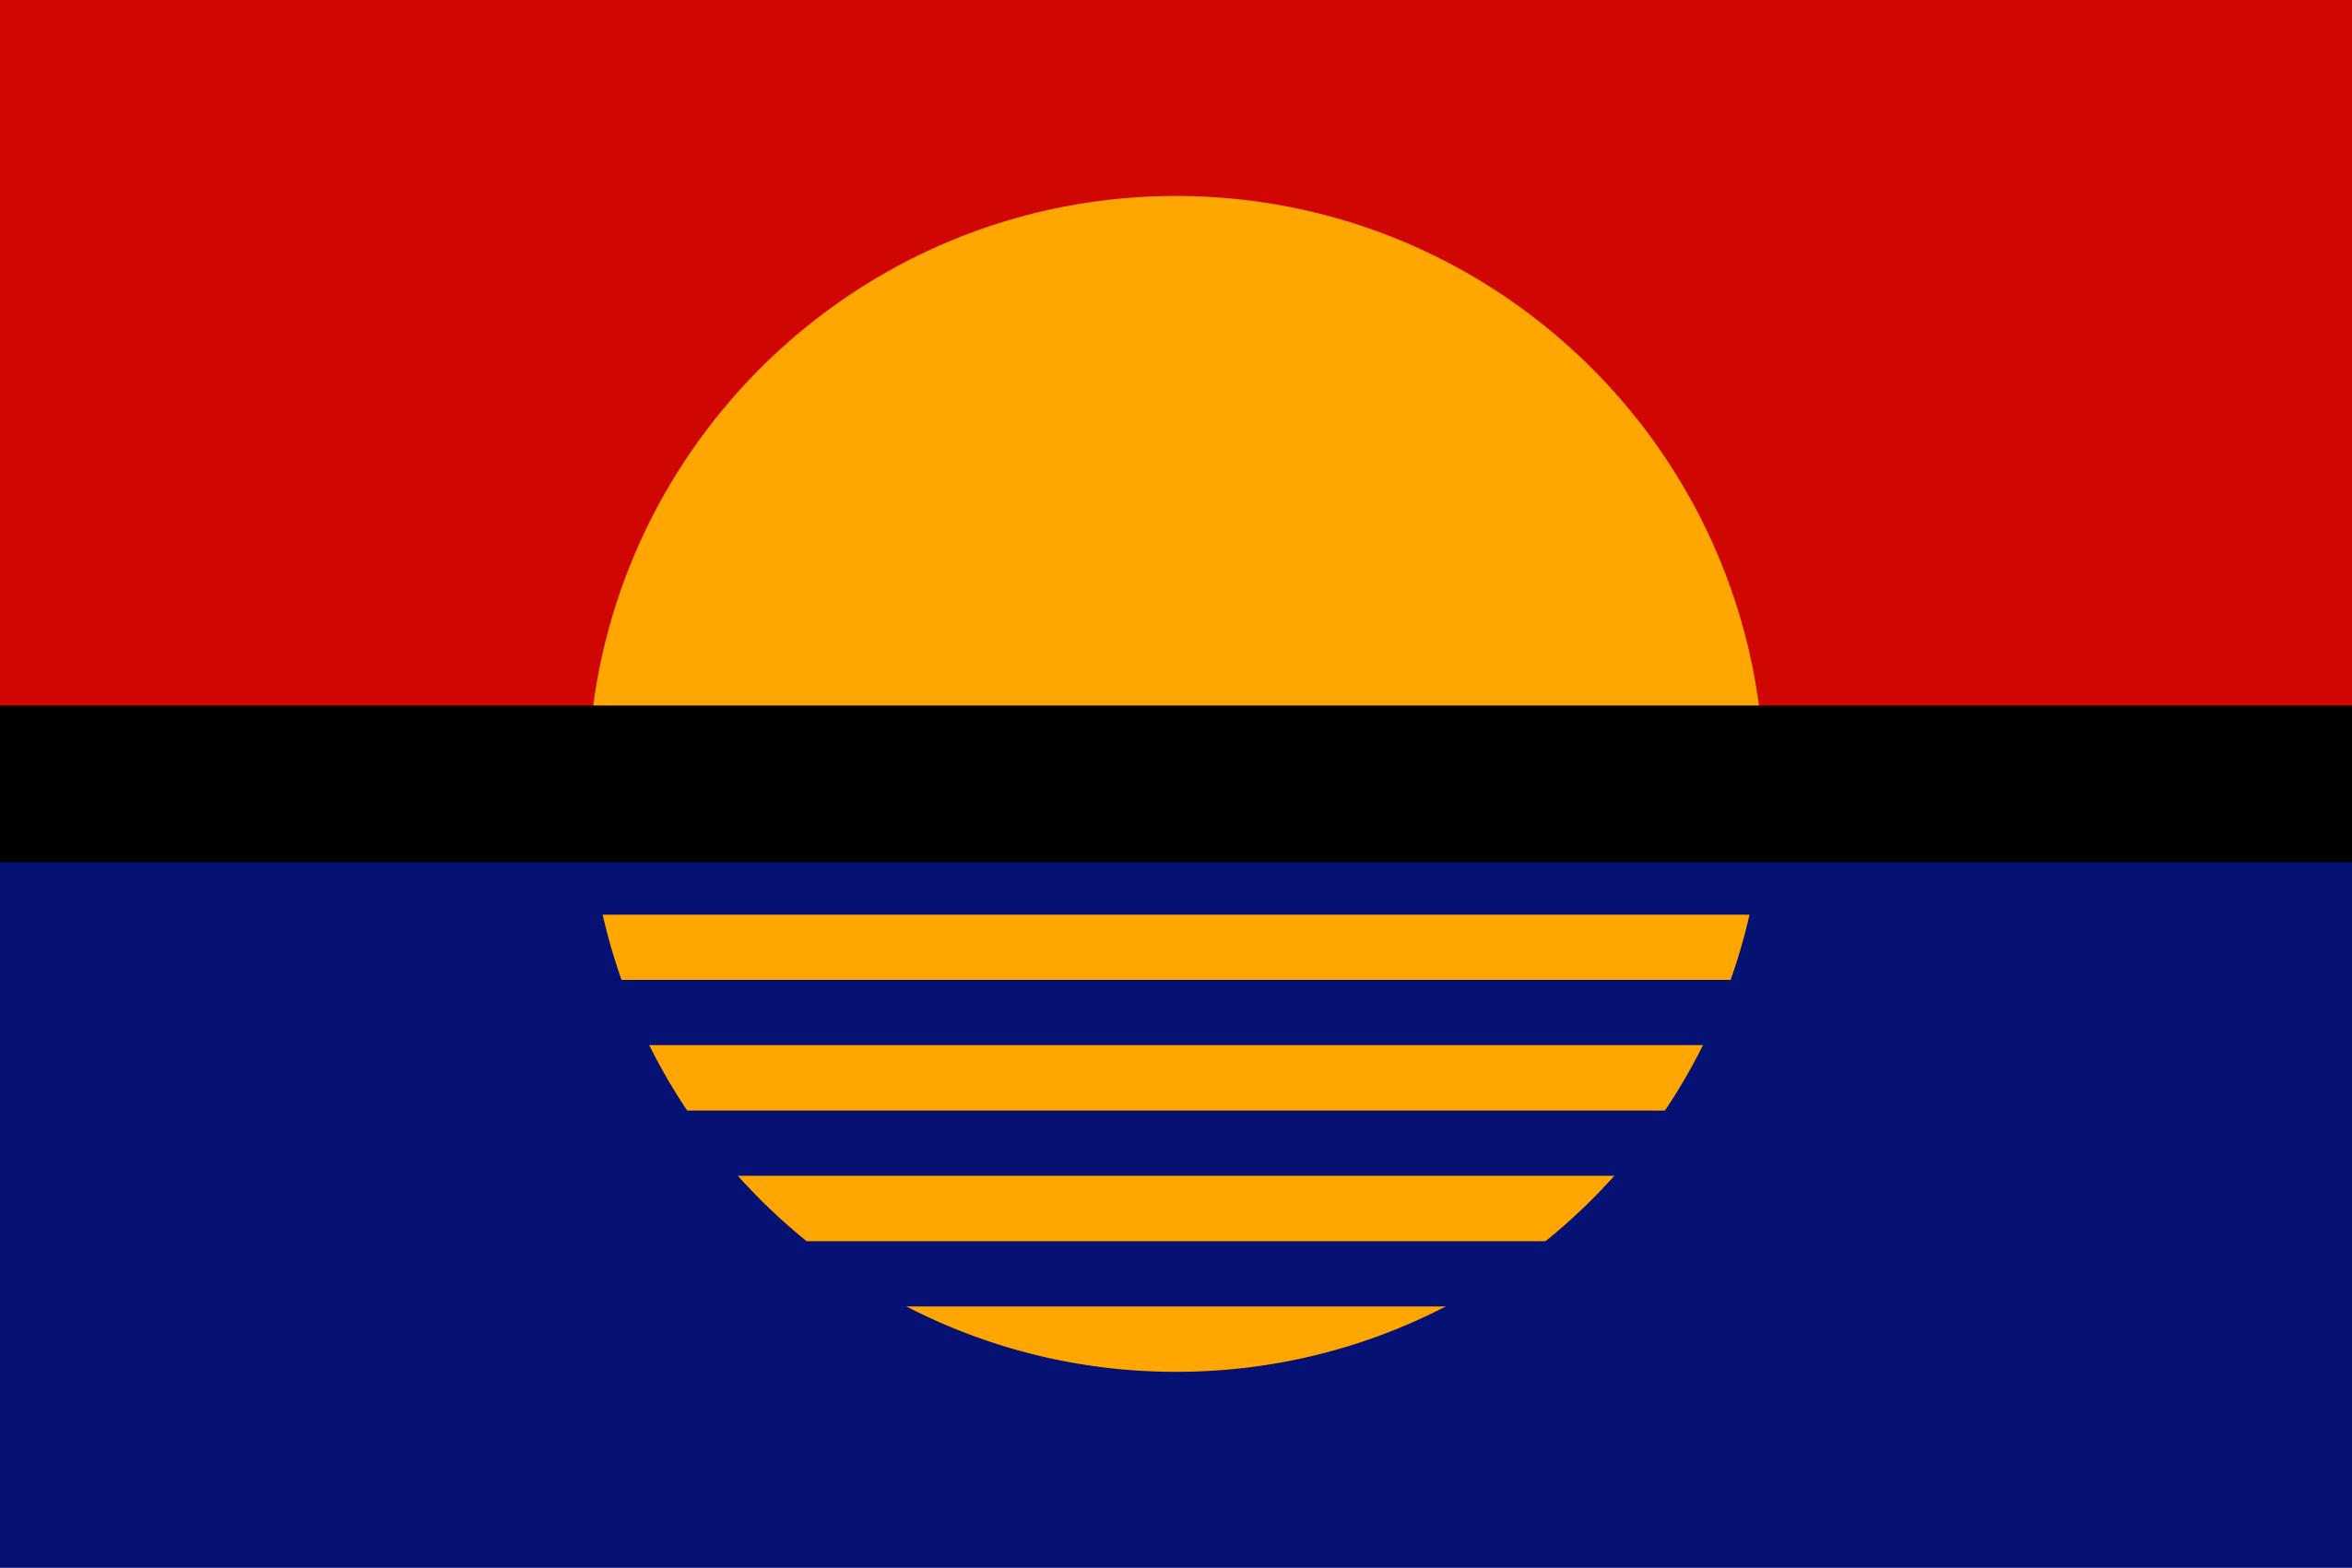 Bocoran Togel Caribbean Sunset Senin, 02 Agustus 2021